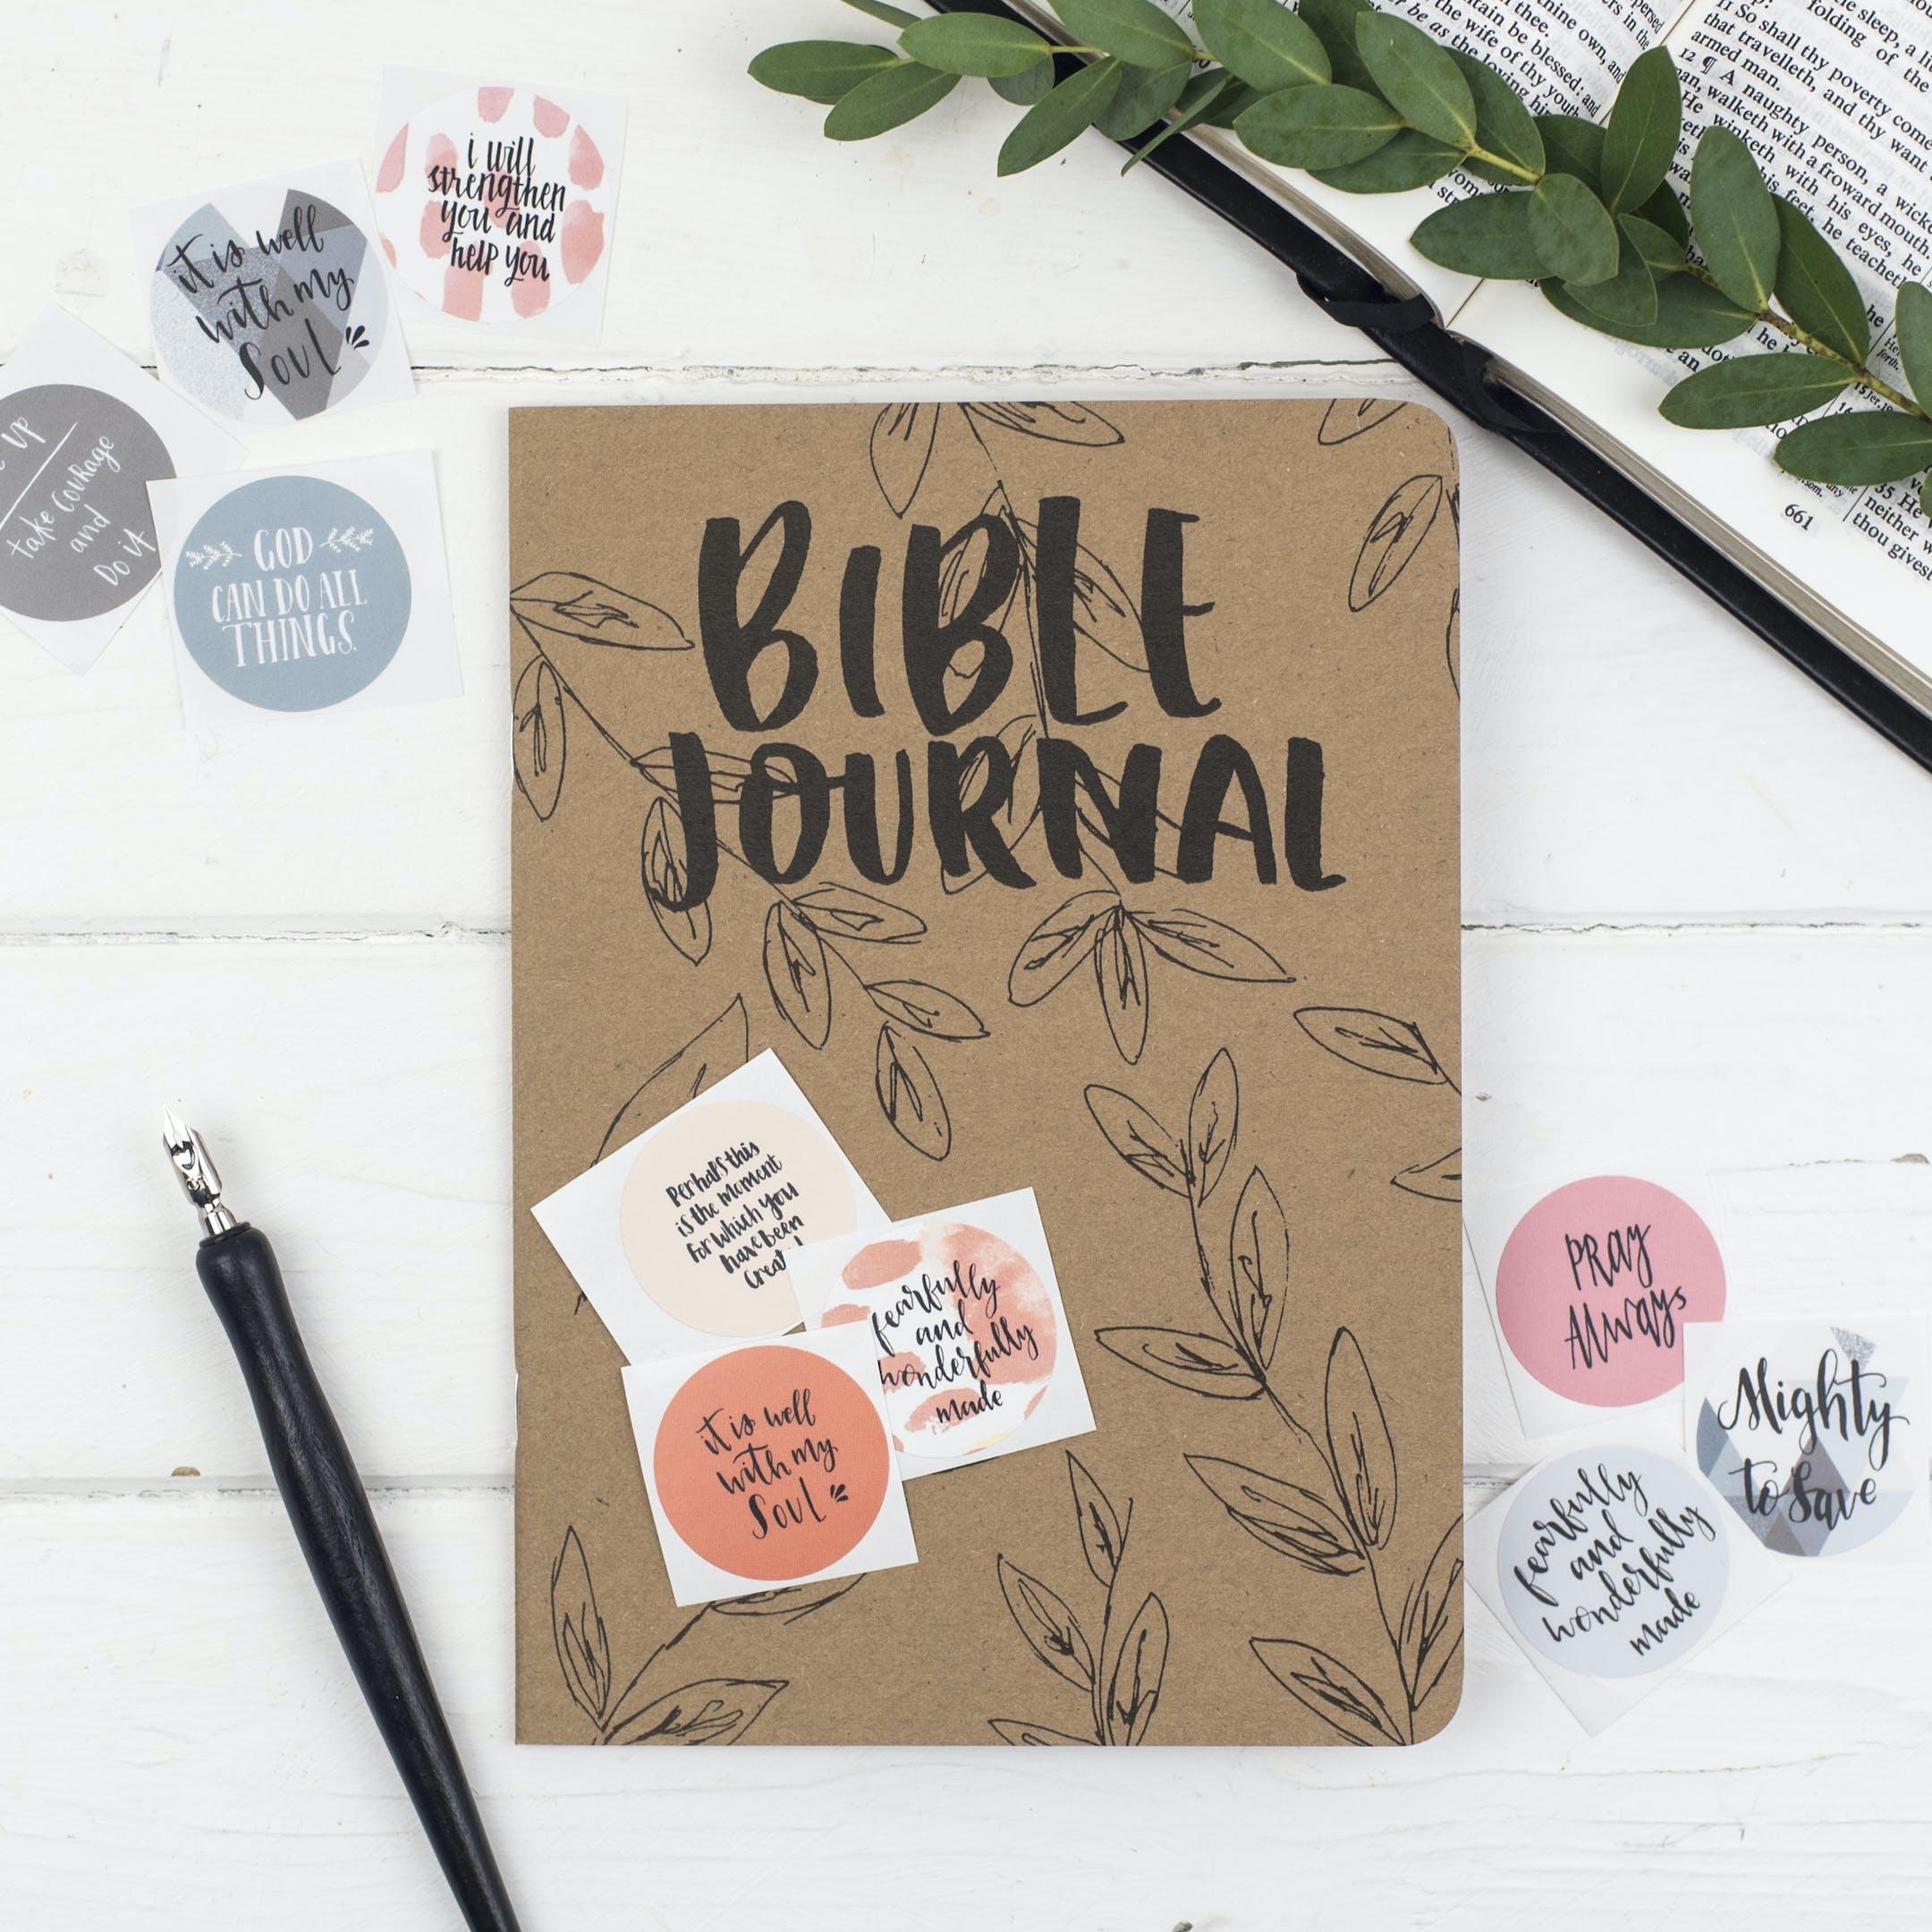 Bible Prayer Journal & Mixed Sticker Set - Christian Lettering Company